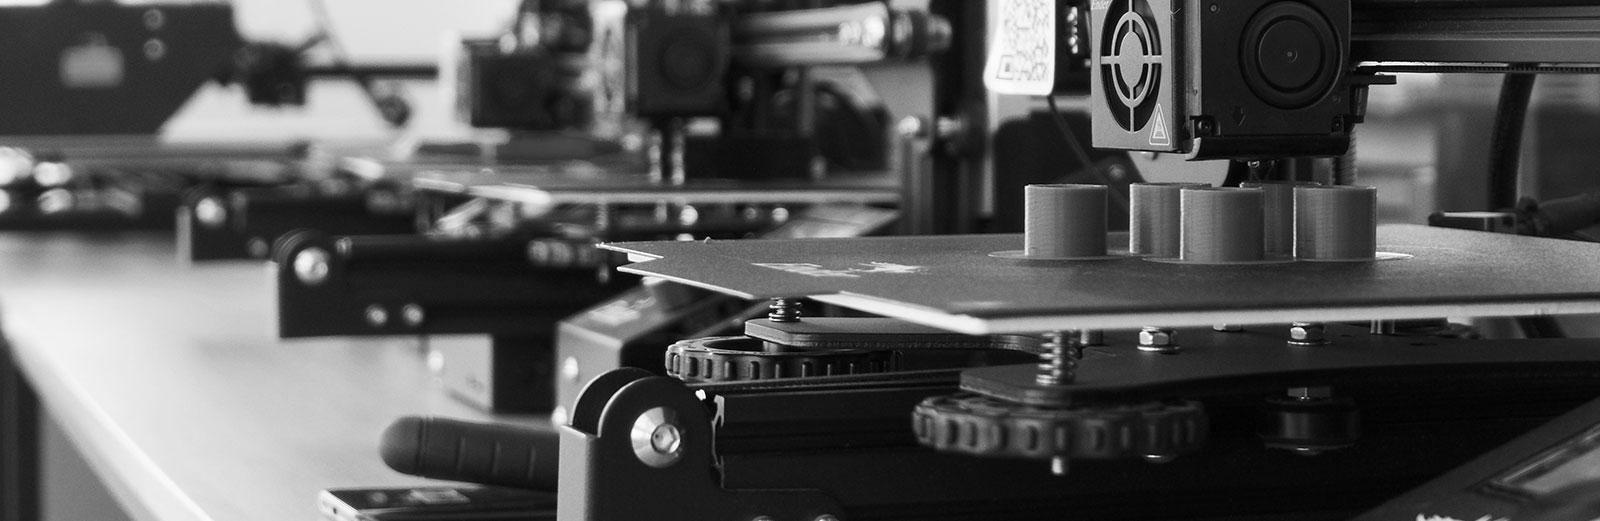 Digital design and fabrication digitally?